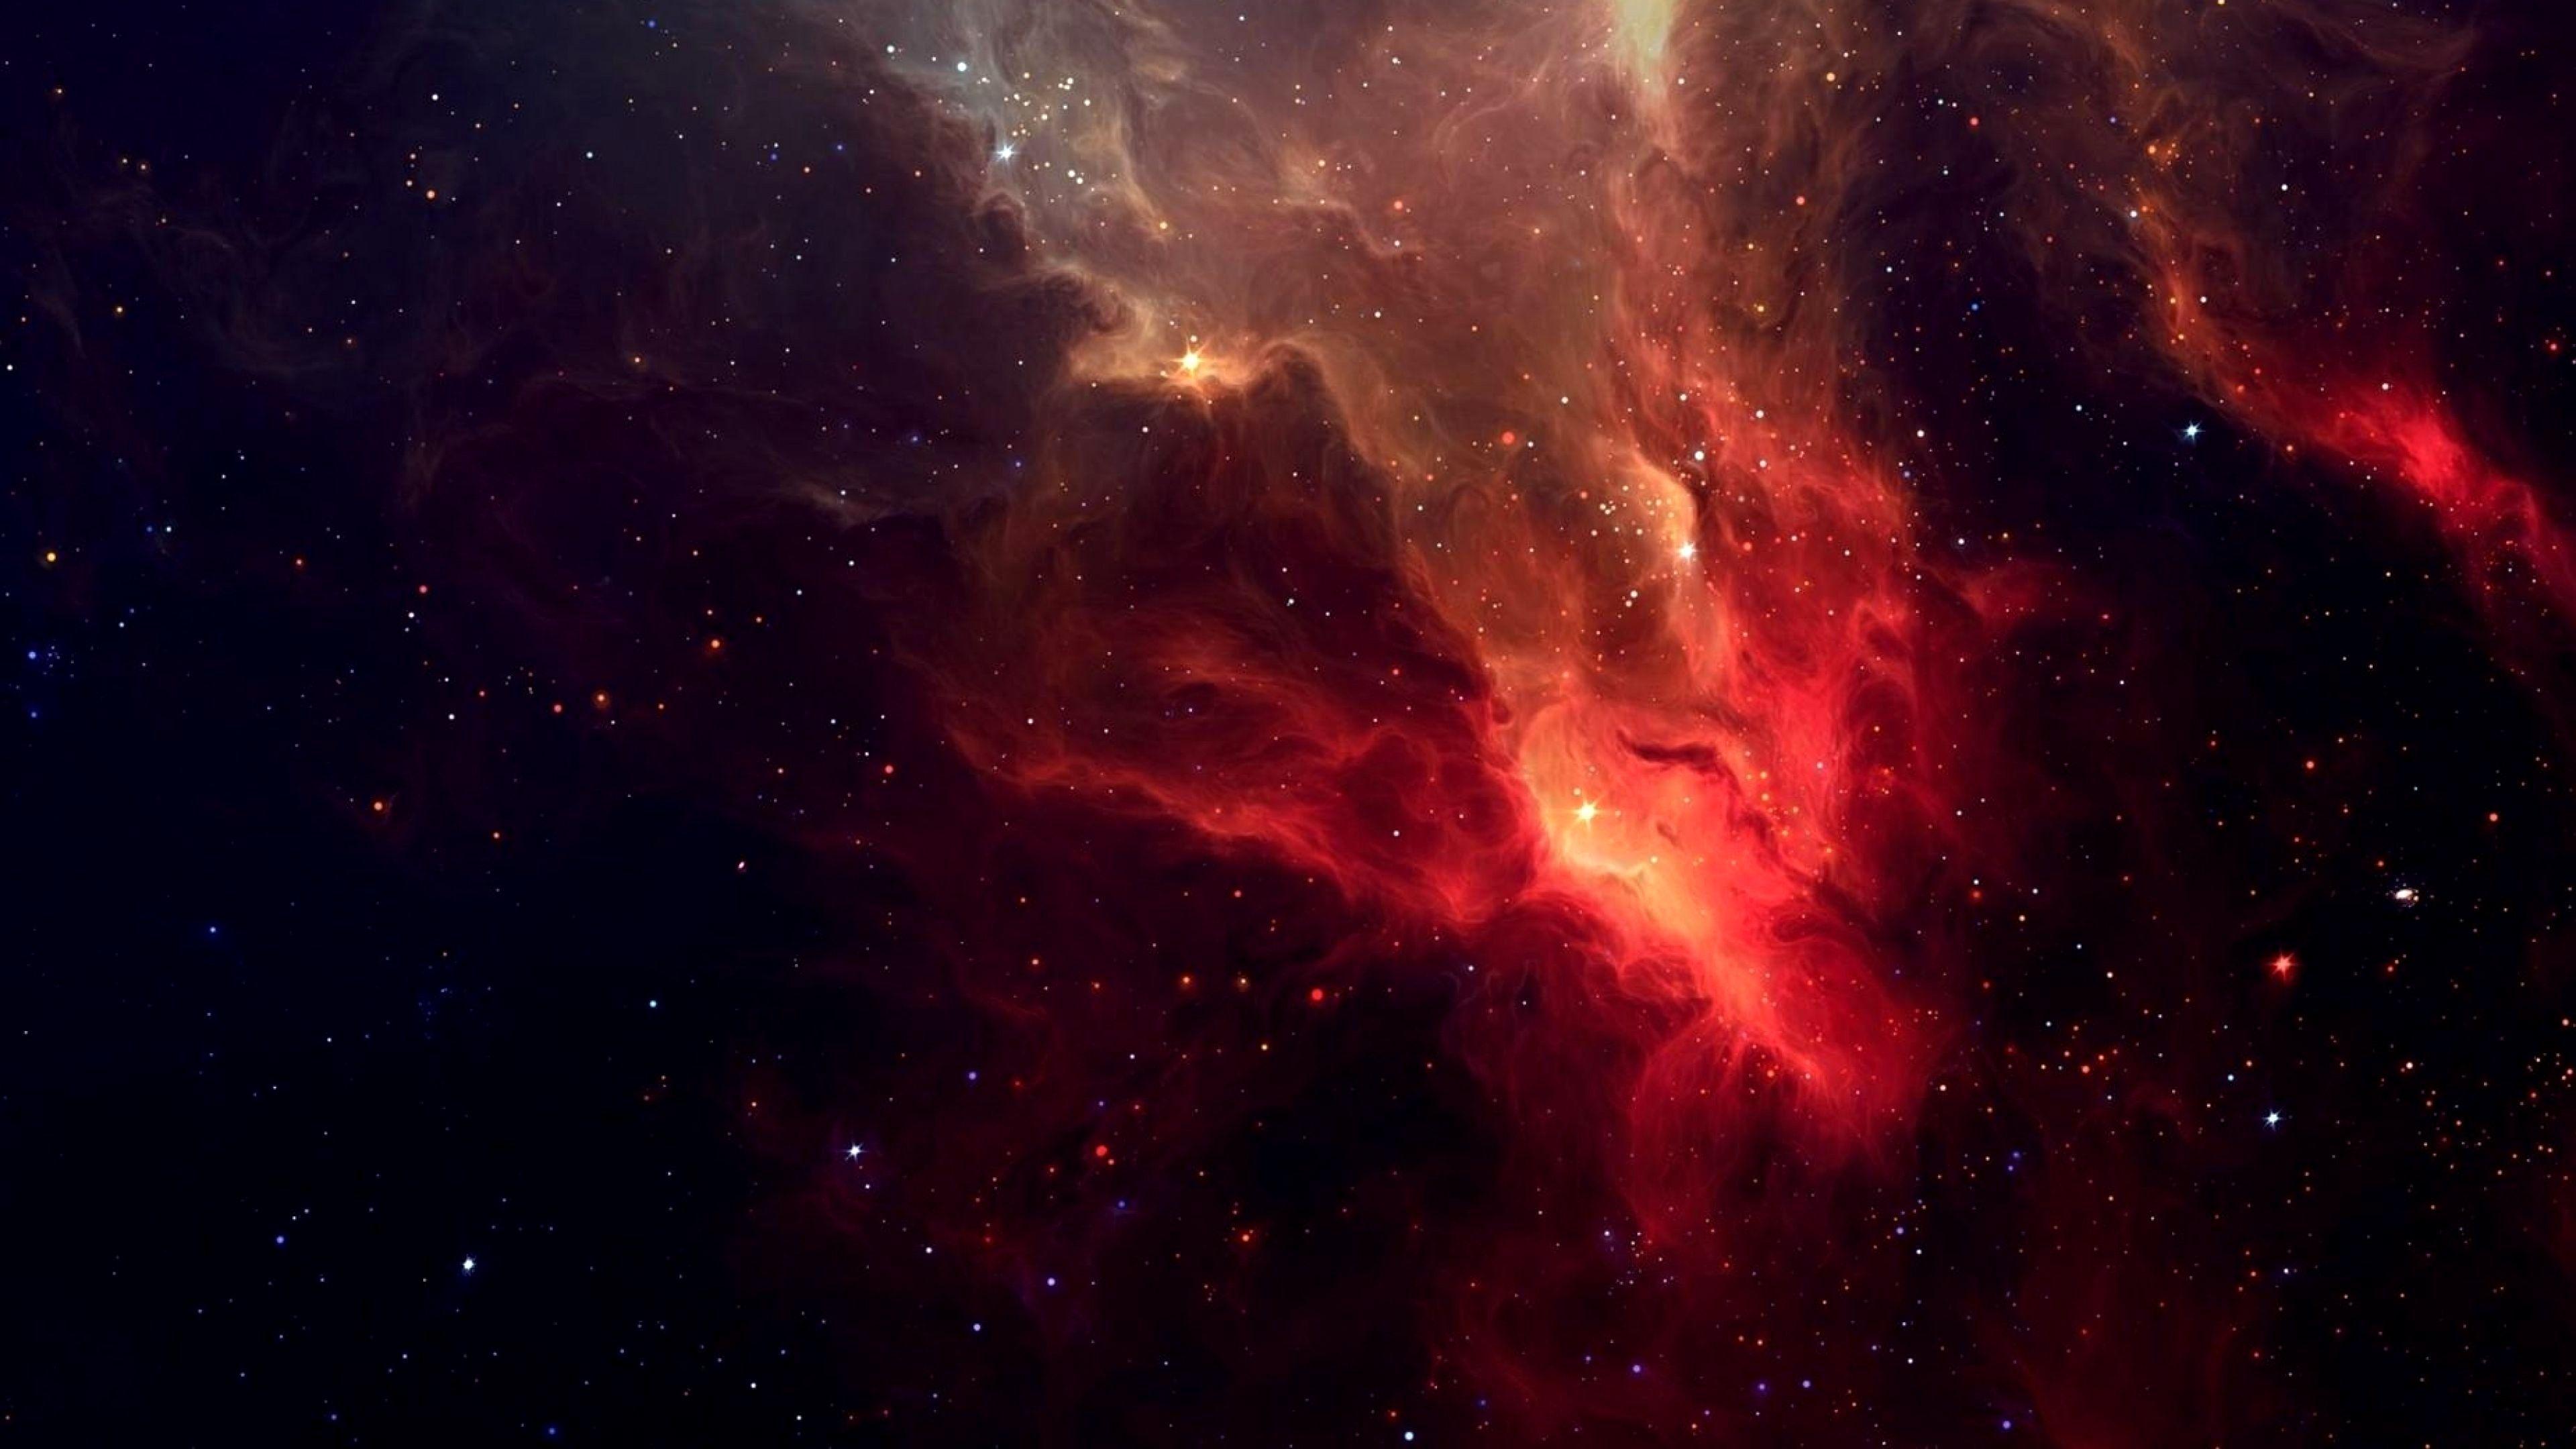 Space Nebula Wallpaper 4k Ideas Gambar Bintang Samsung Galaxy